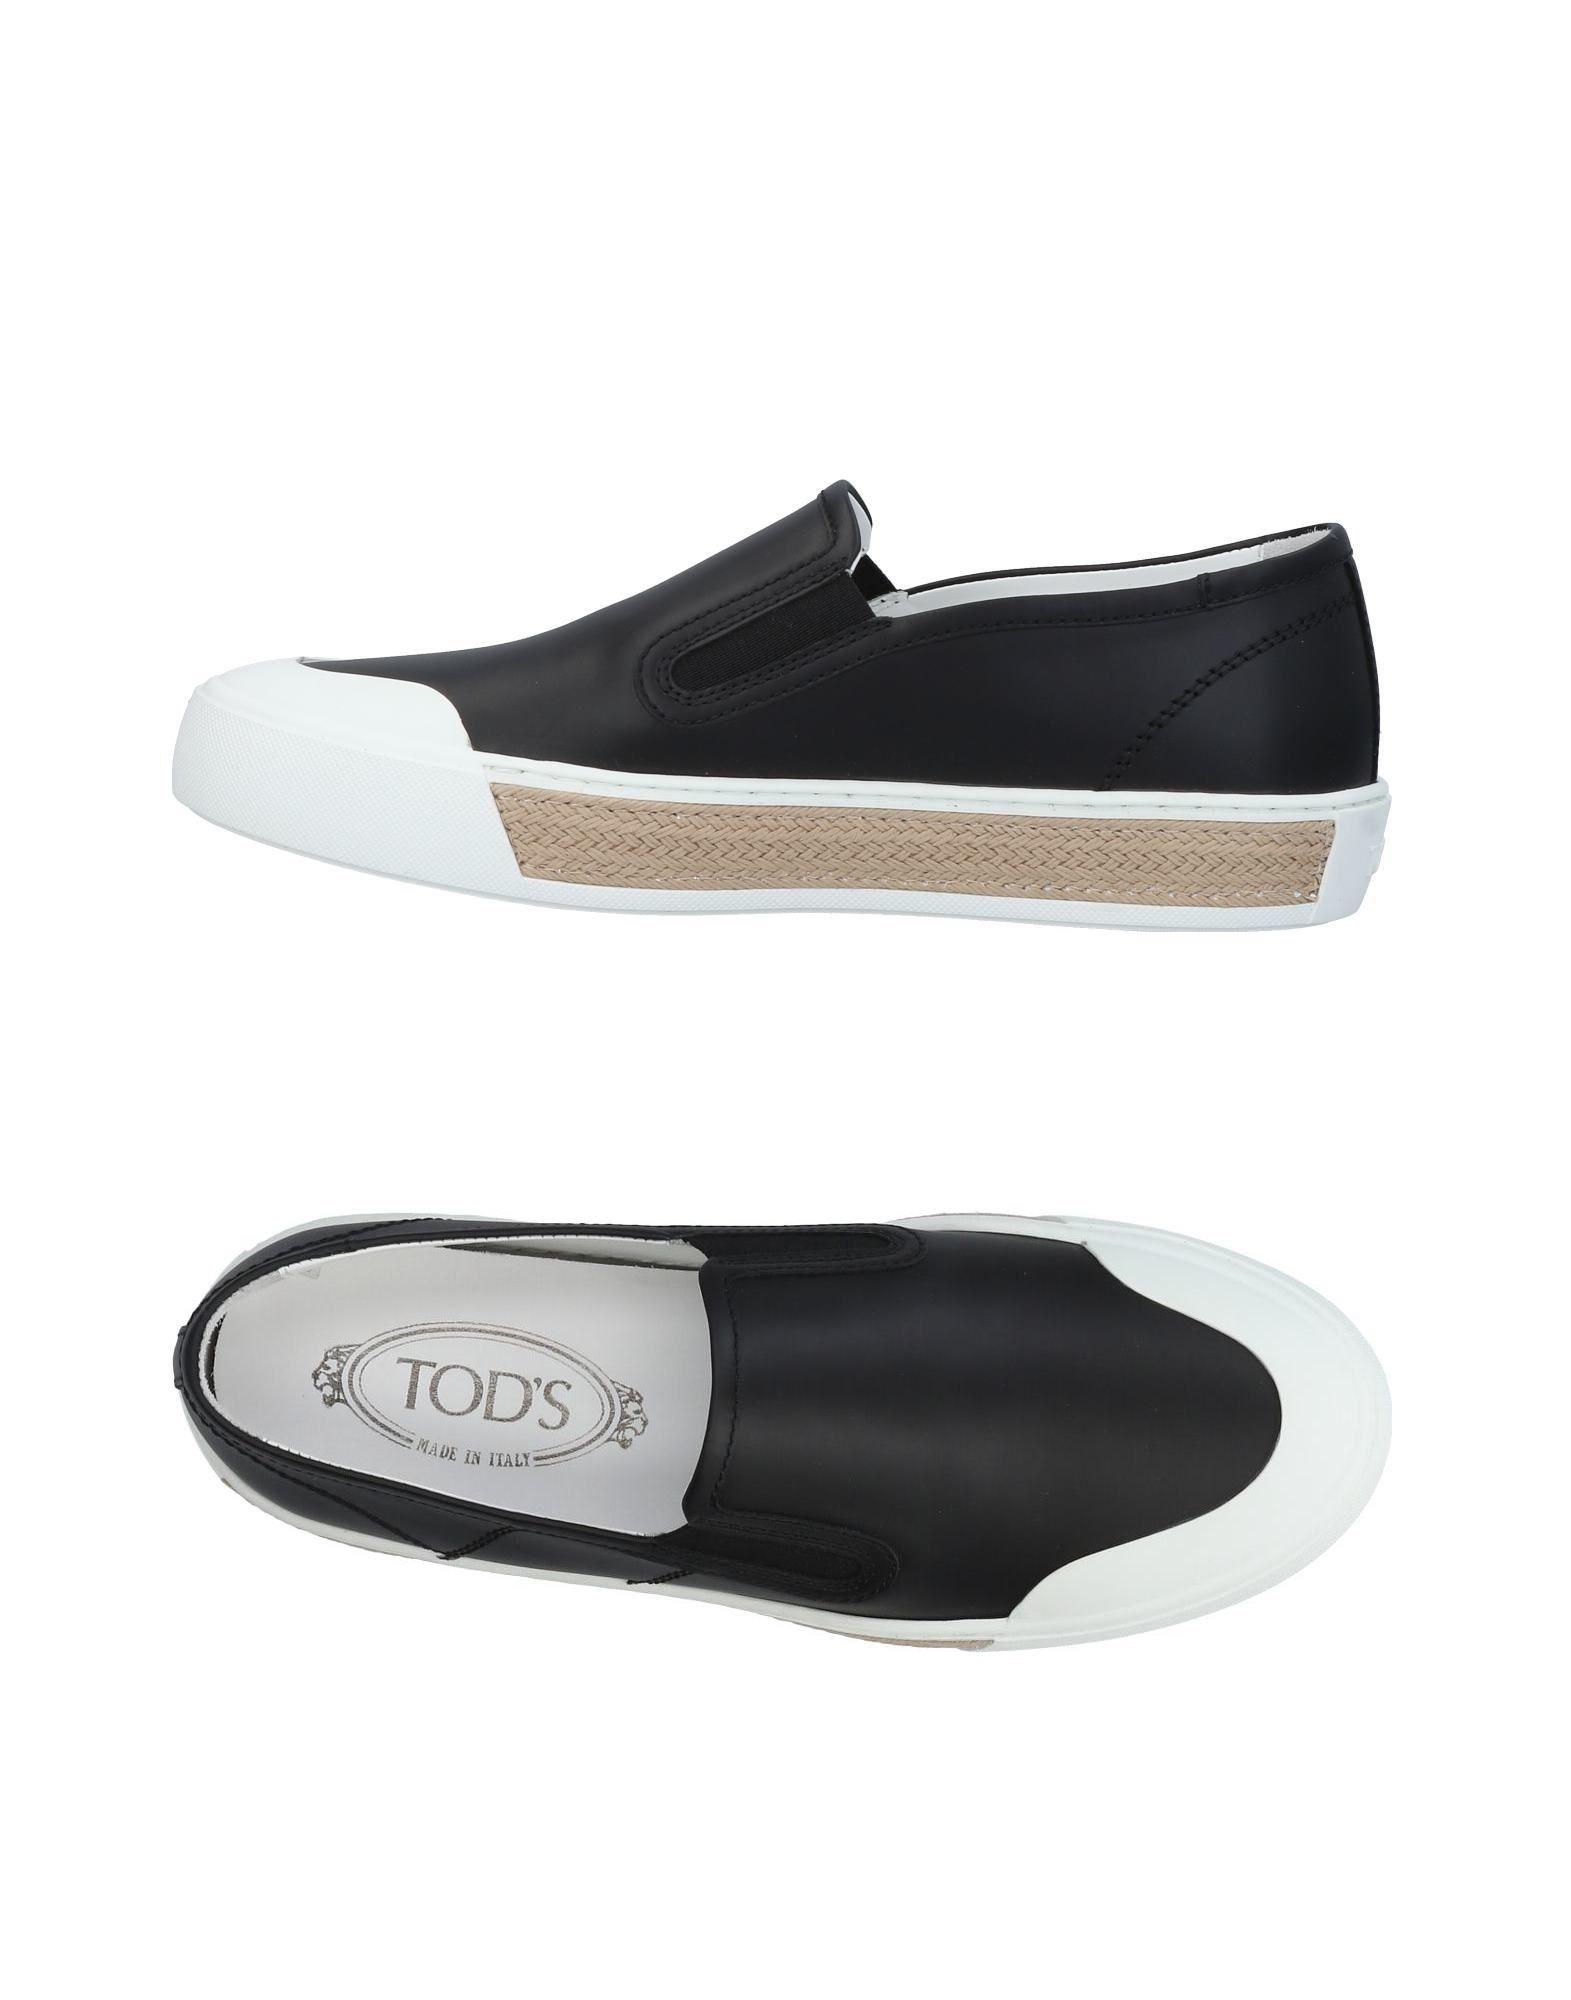 Moda Sneakers Sneakers Moda Tod's Donna - 11443669RA 6ffe78